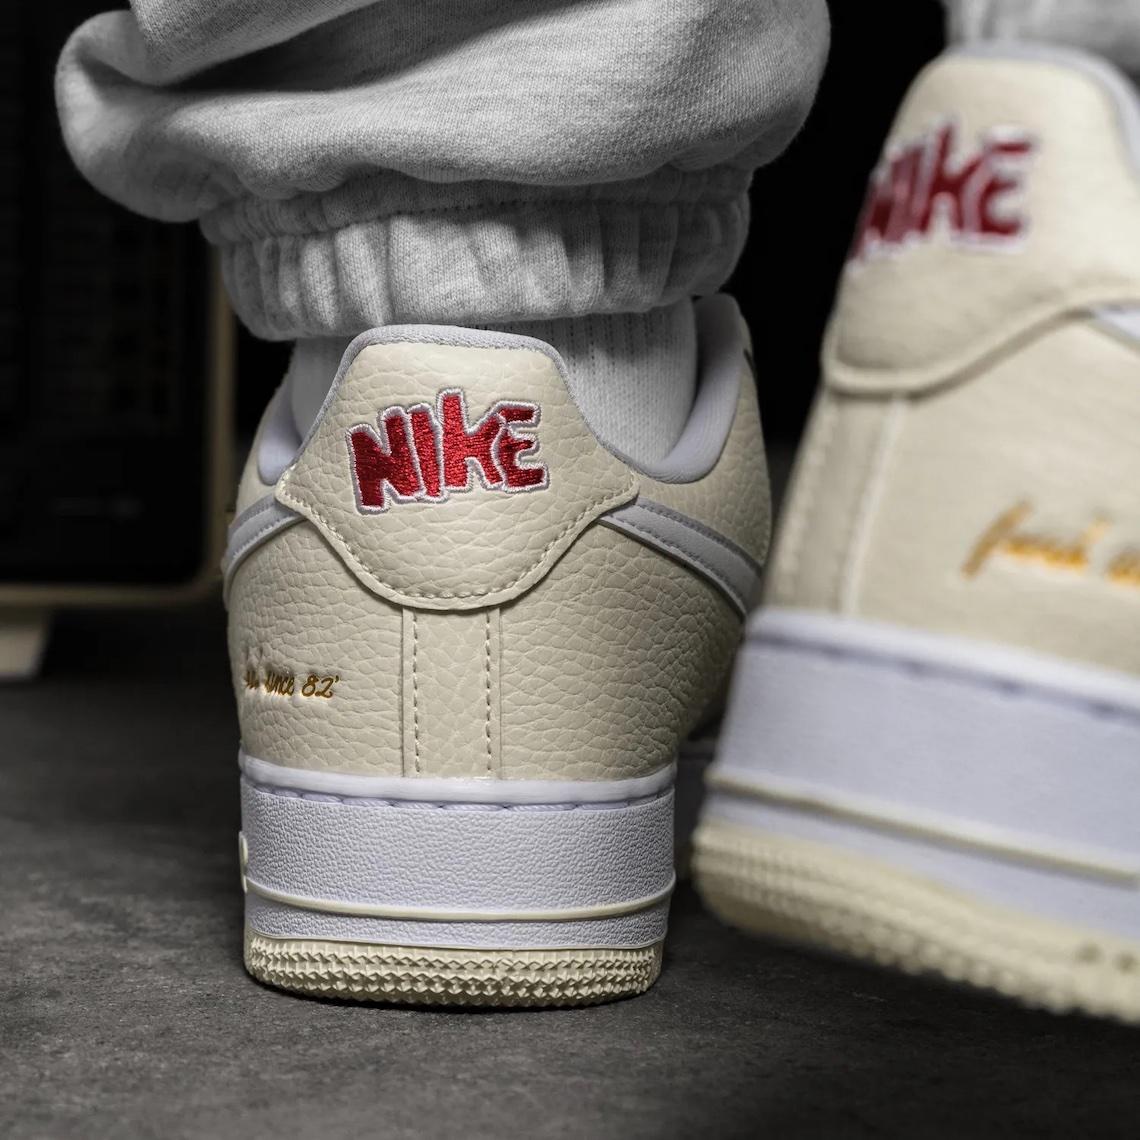 Nike-Air-Force-1-Popcorn-CW2919-100-12.jpeg?w=1140